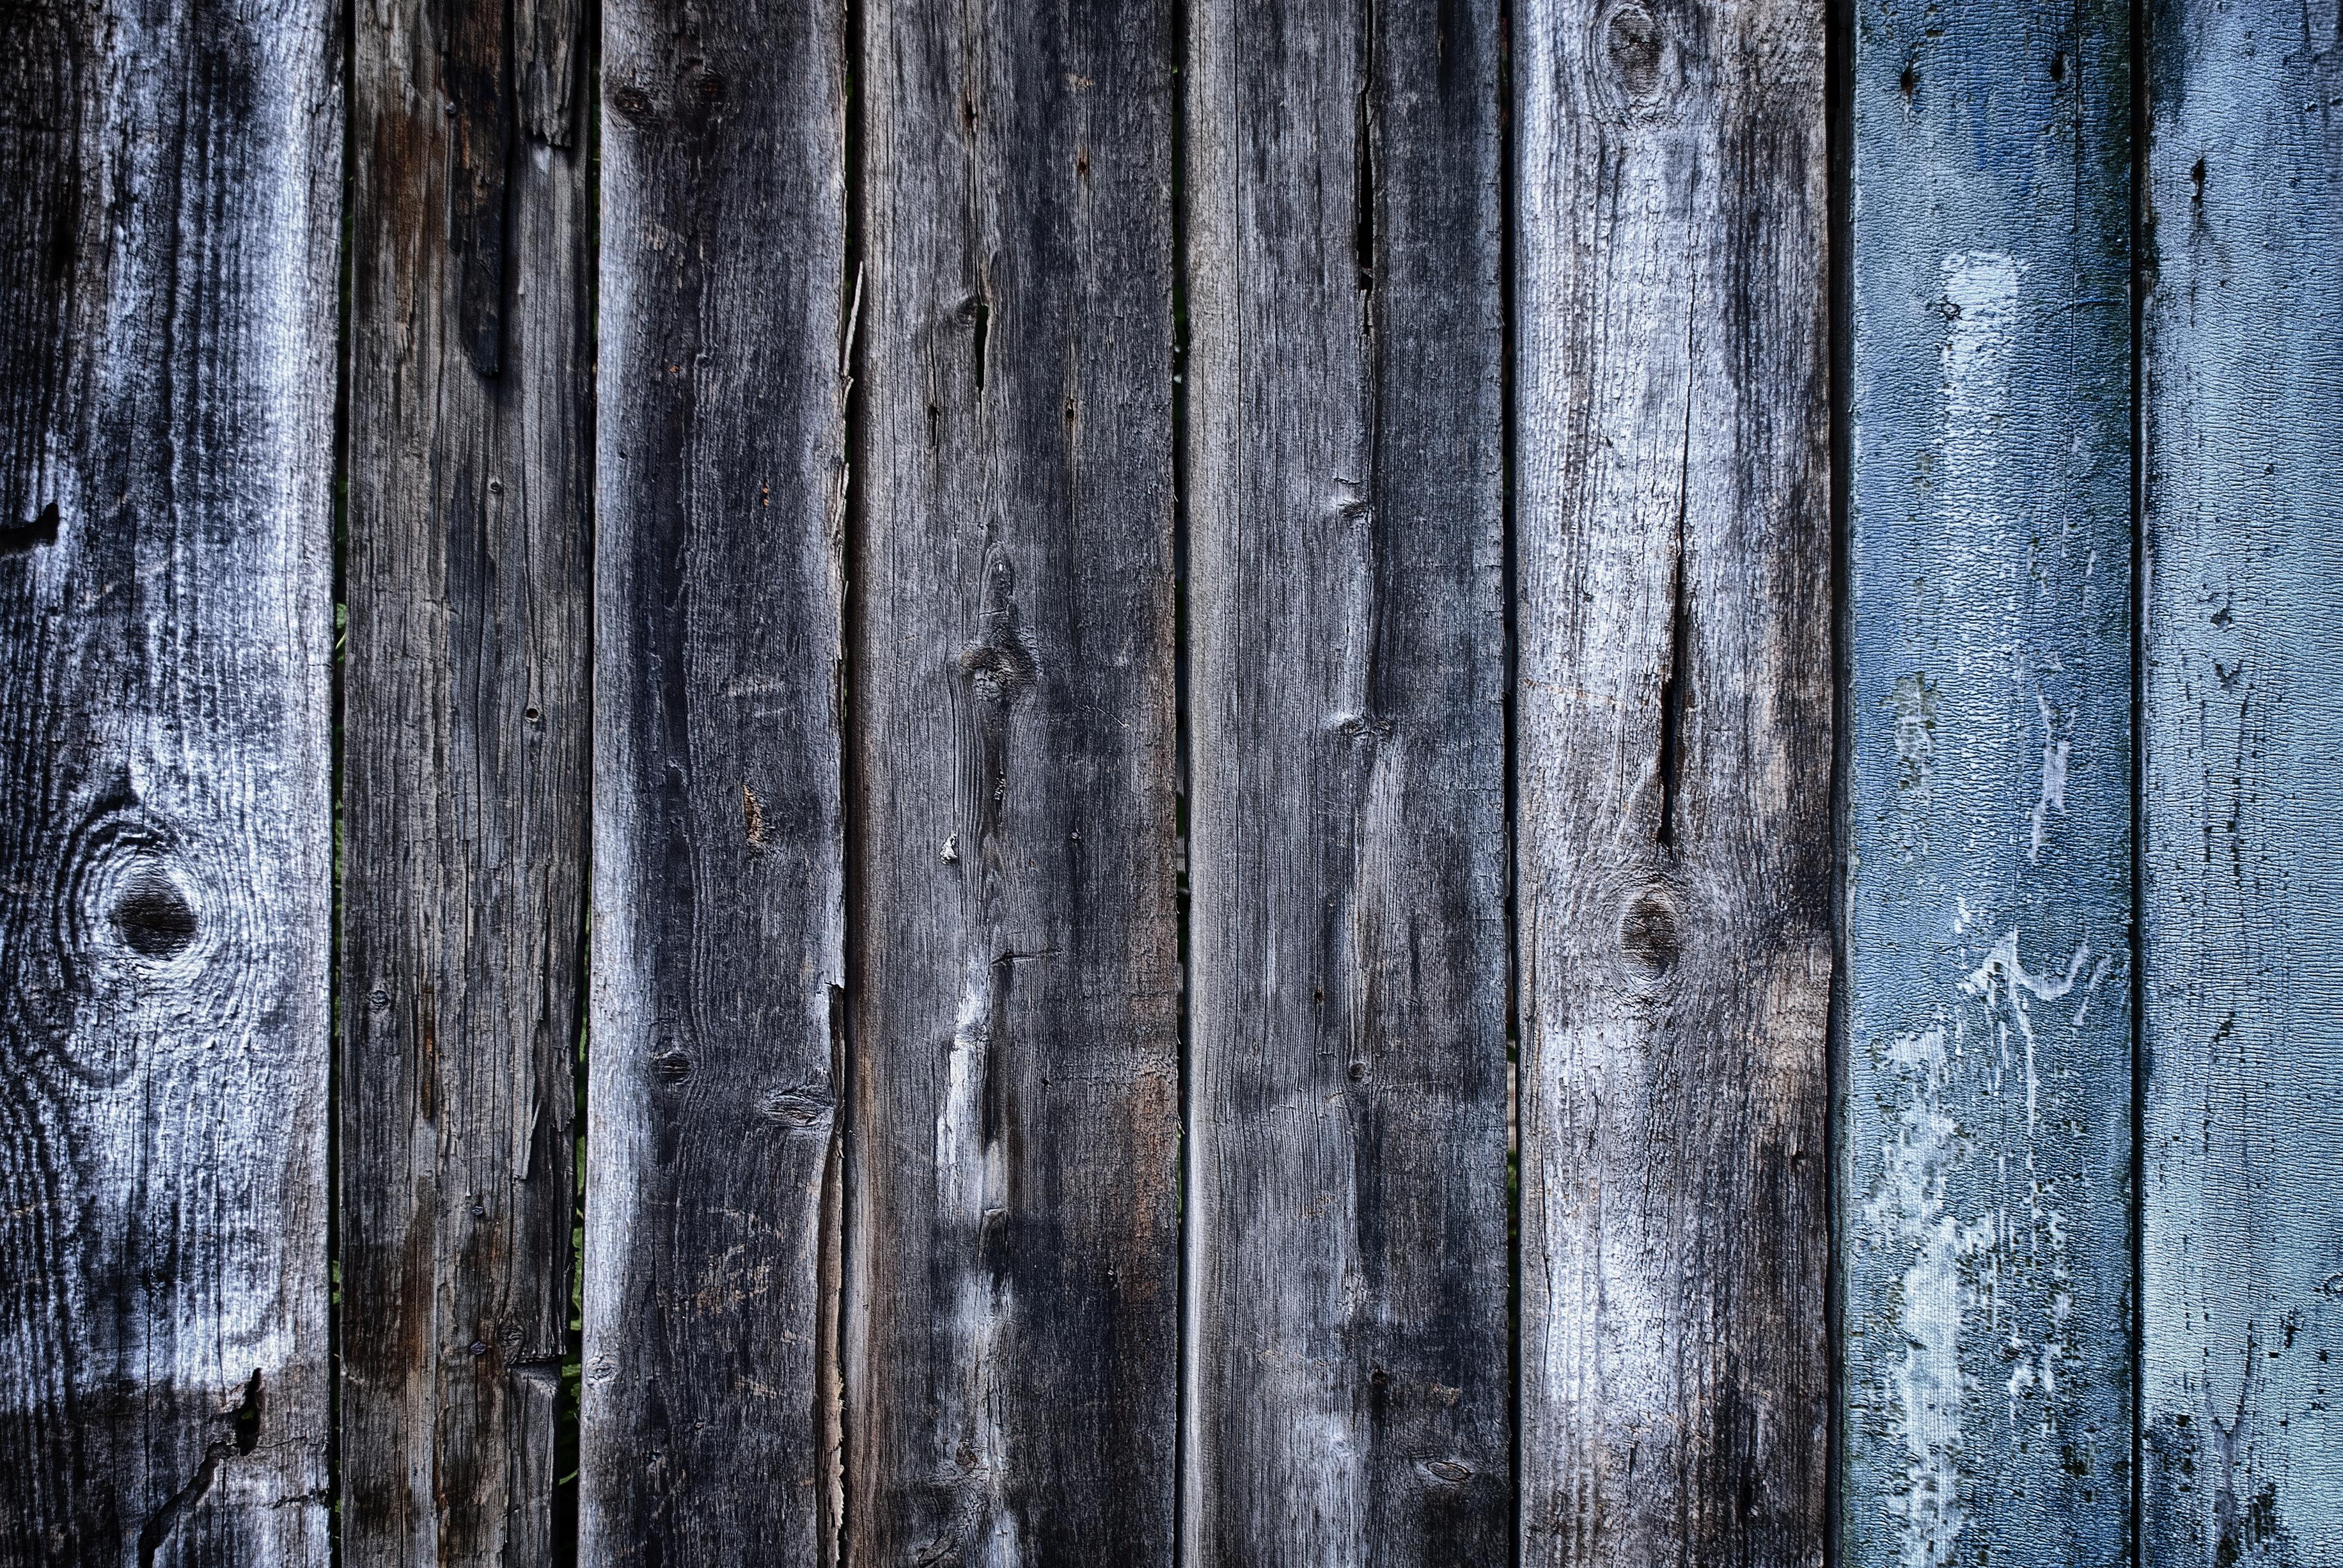 photo of the wood boards, photo of the wood boards